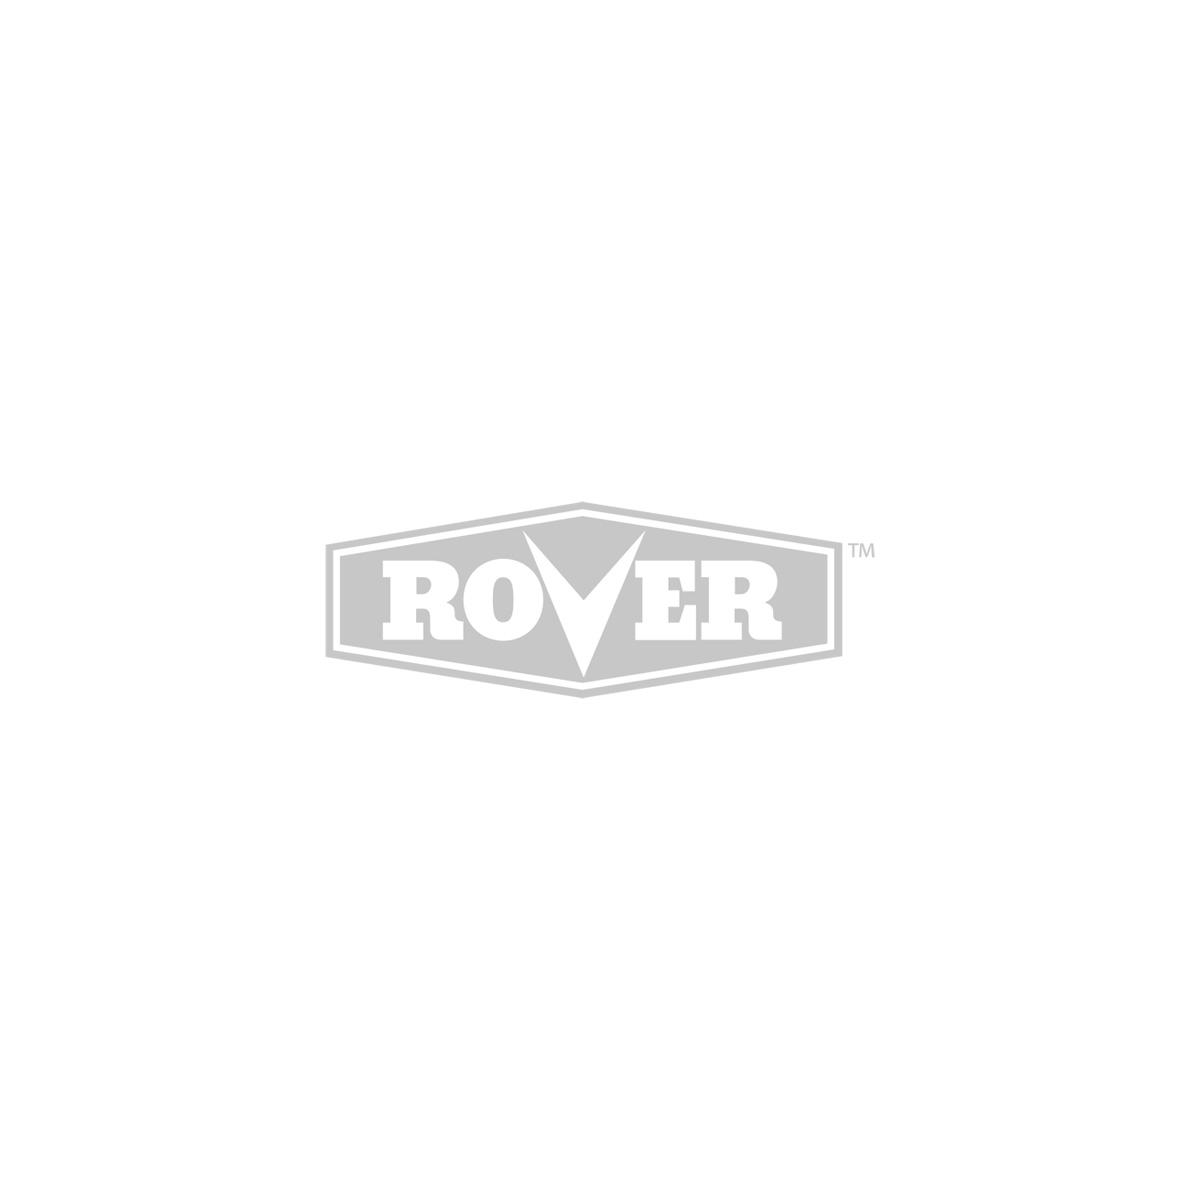 XT1 LX 42 Ride on mower